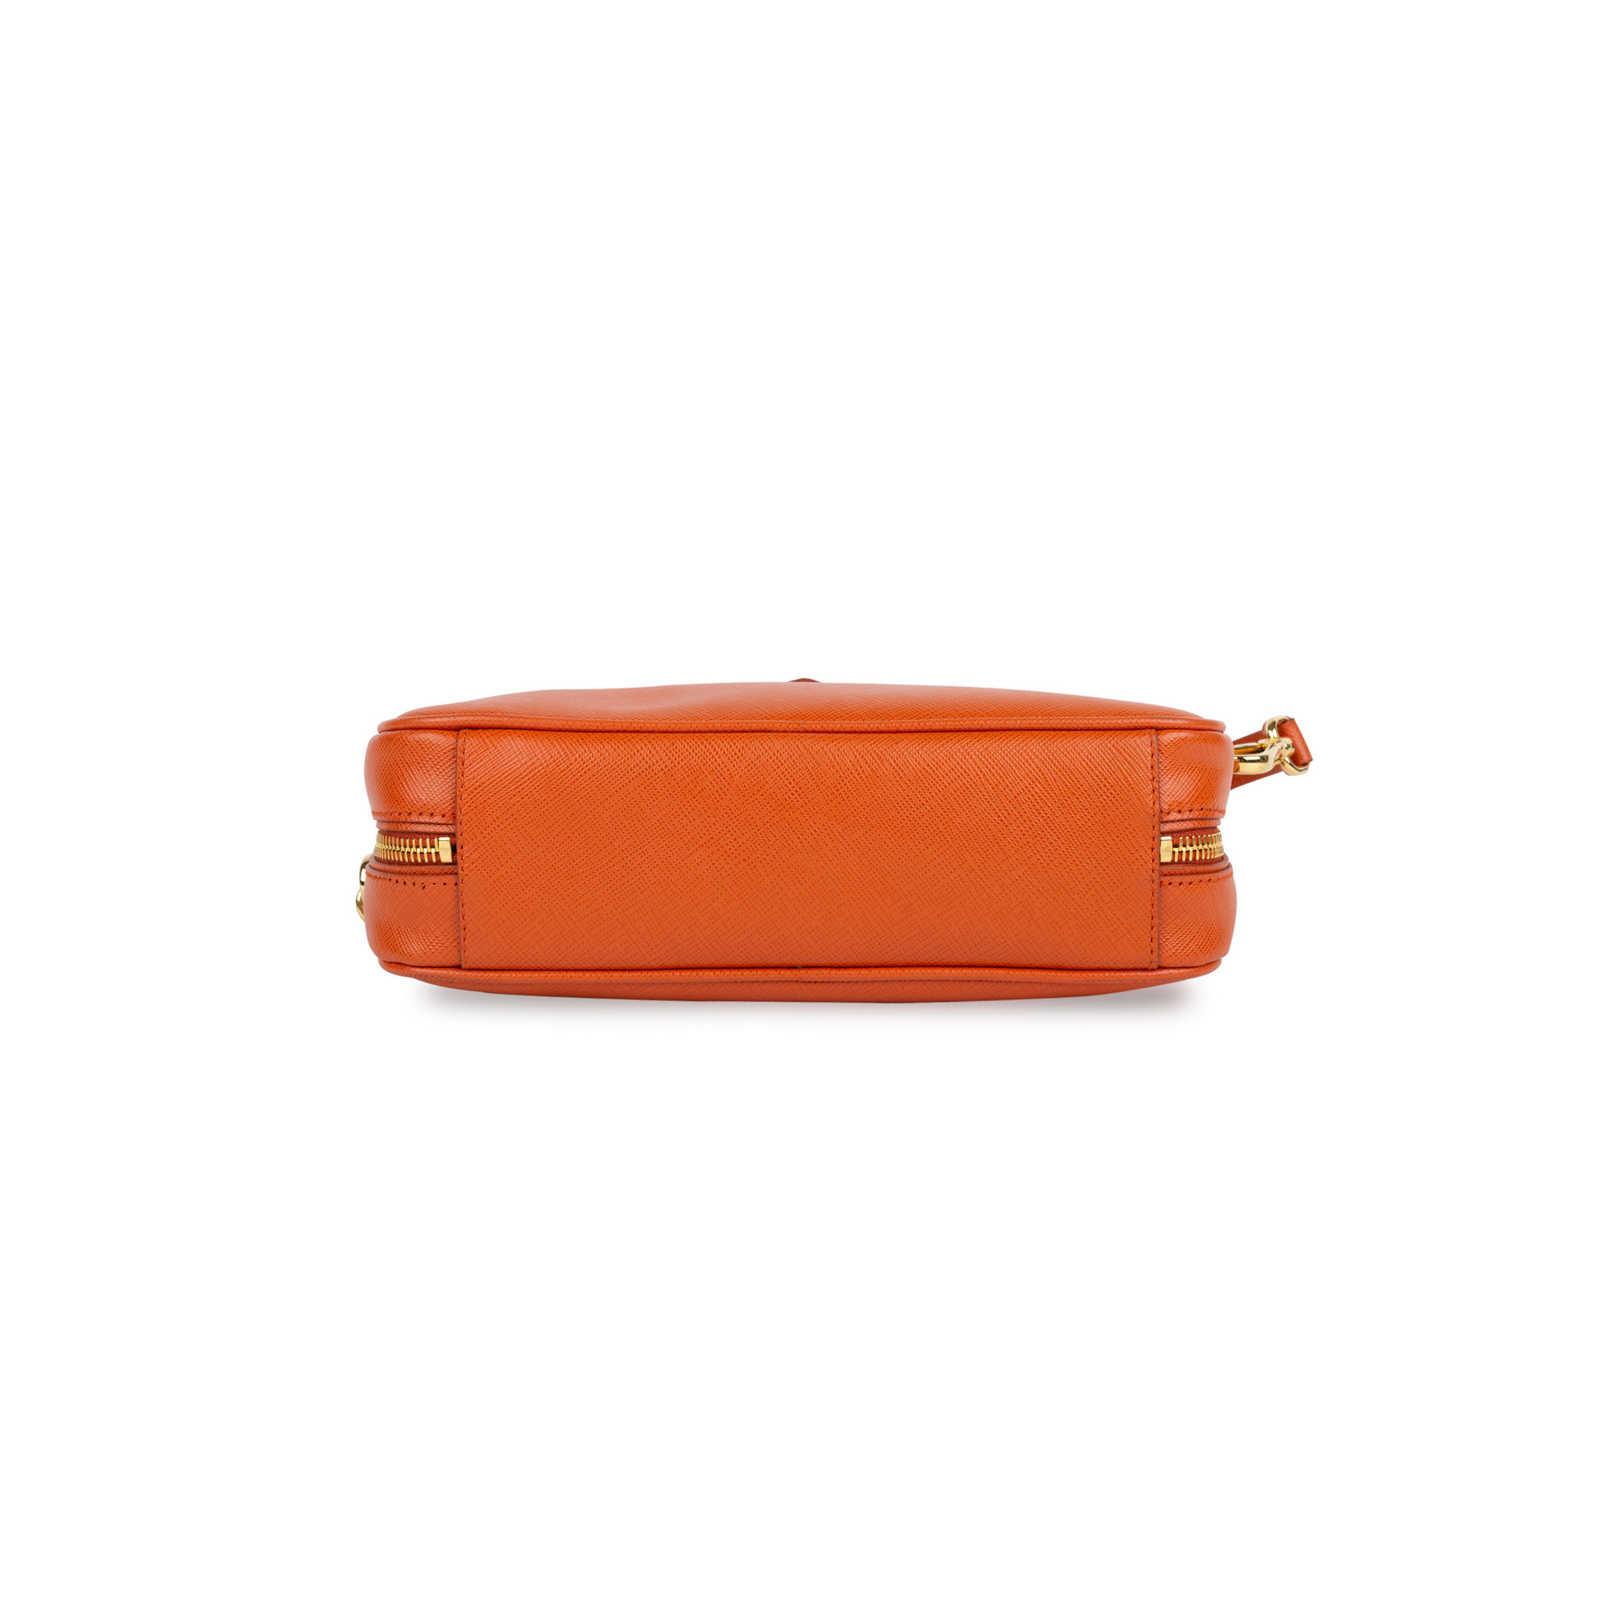 01d7f7e7d394 ... Authentic Second Hand Prada Saffiano Lux Pochette (PSS-434-00012) -  Thumbnail ...